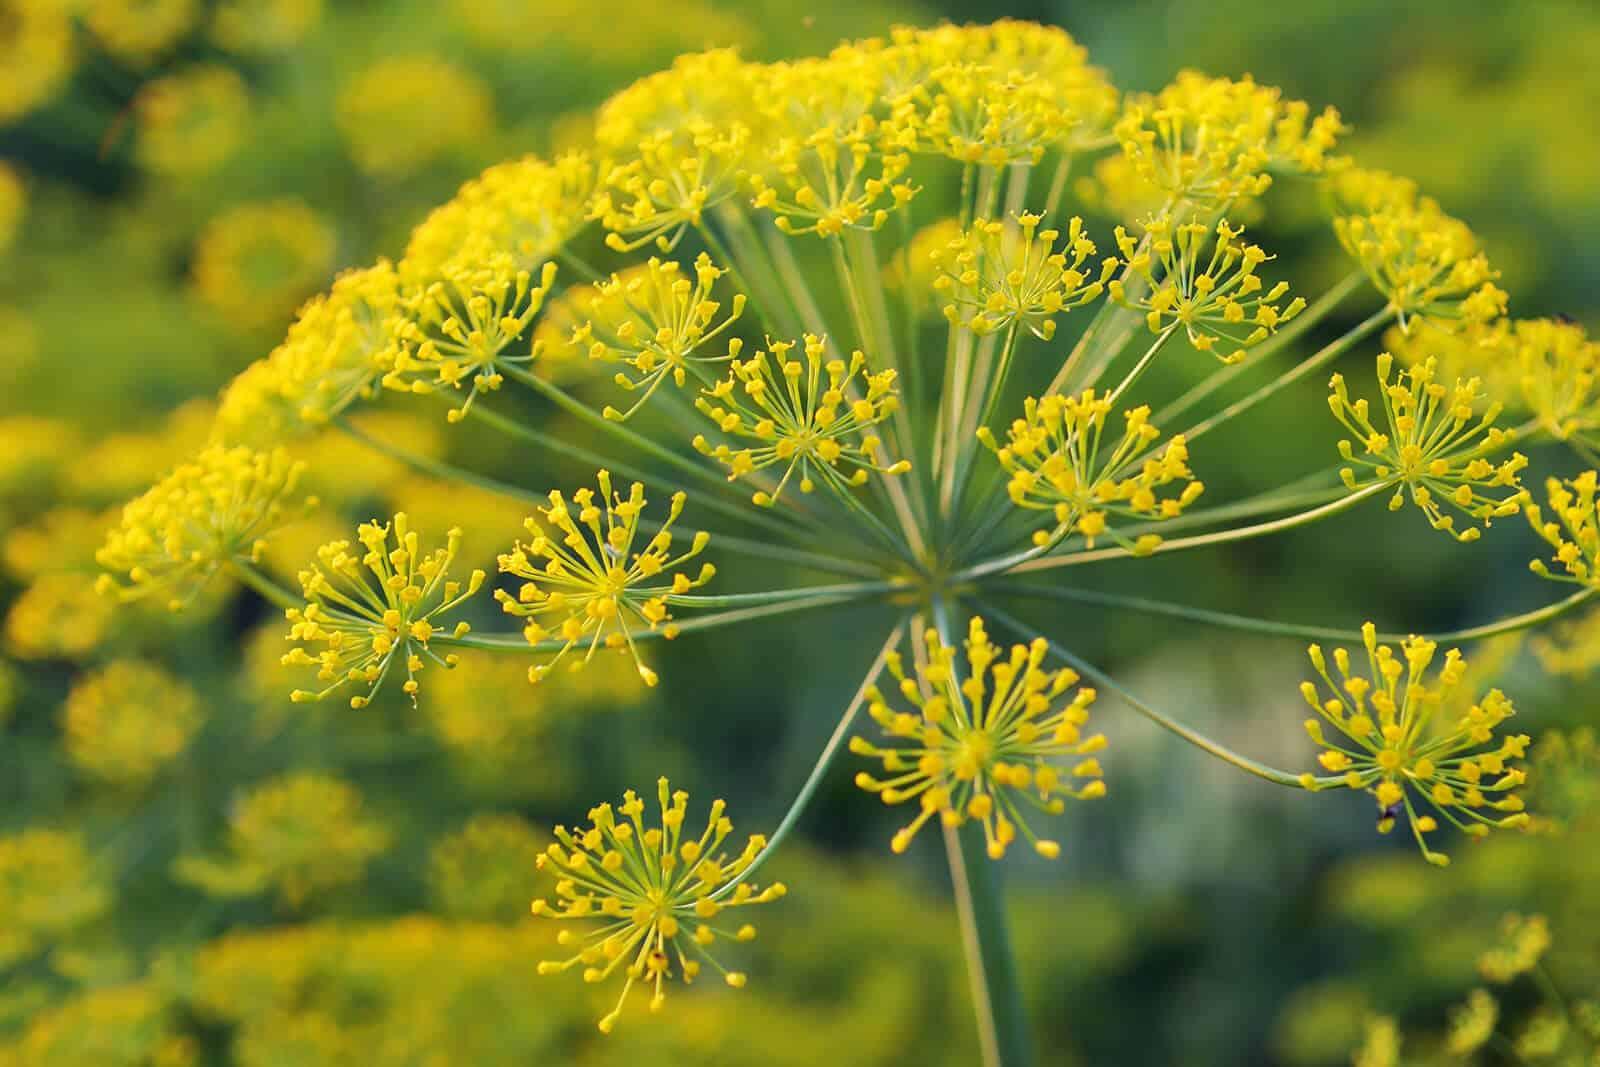 wellnessaromas-aromatherapy-essential-oil_galbanum-benefits-uses